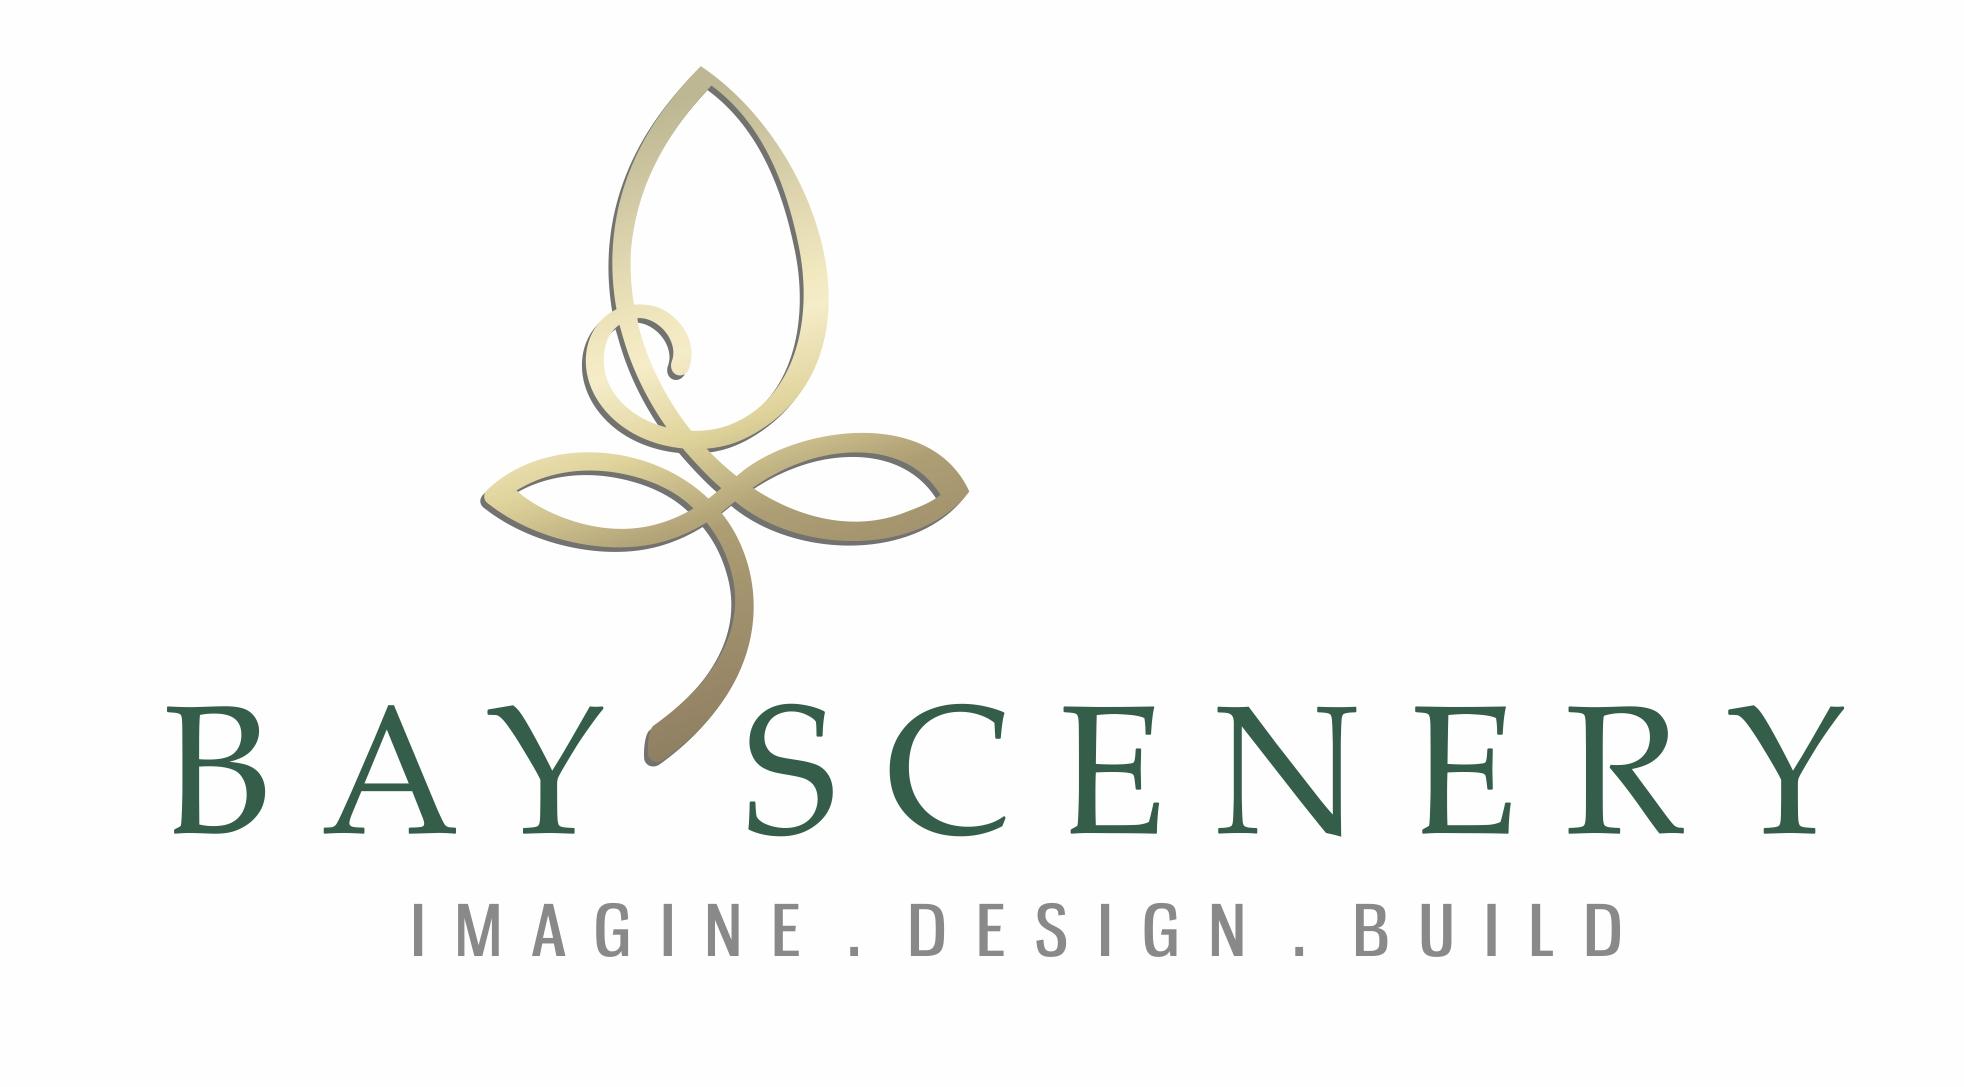 Bay scenery logo png (1).jpg